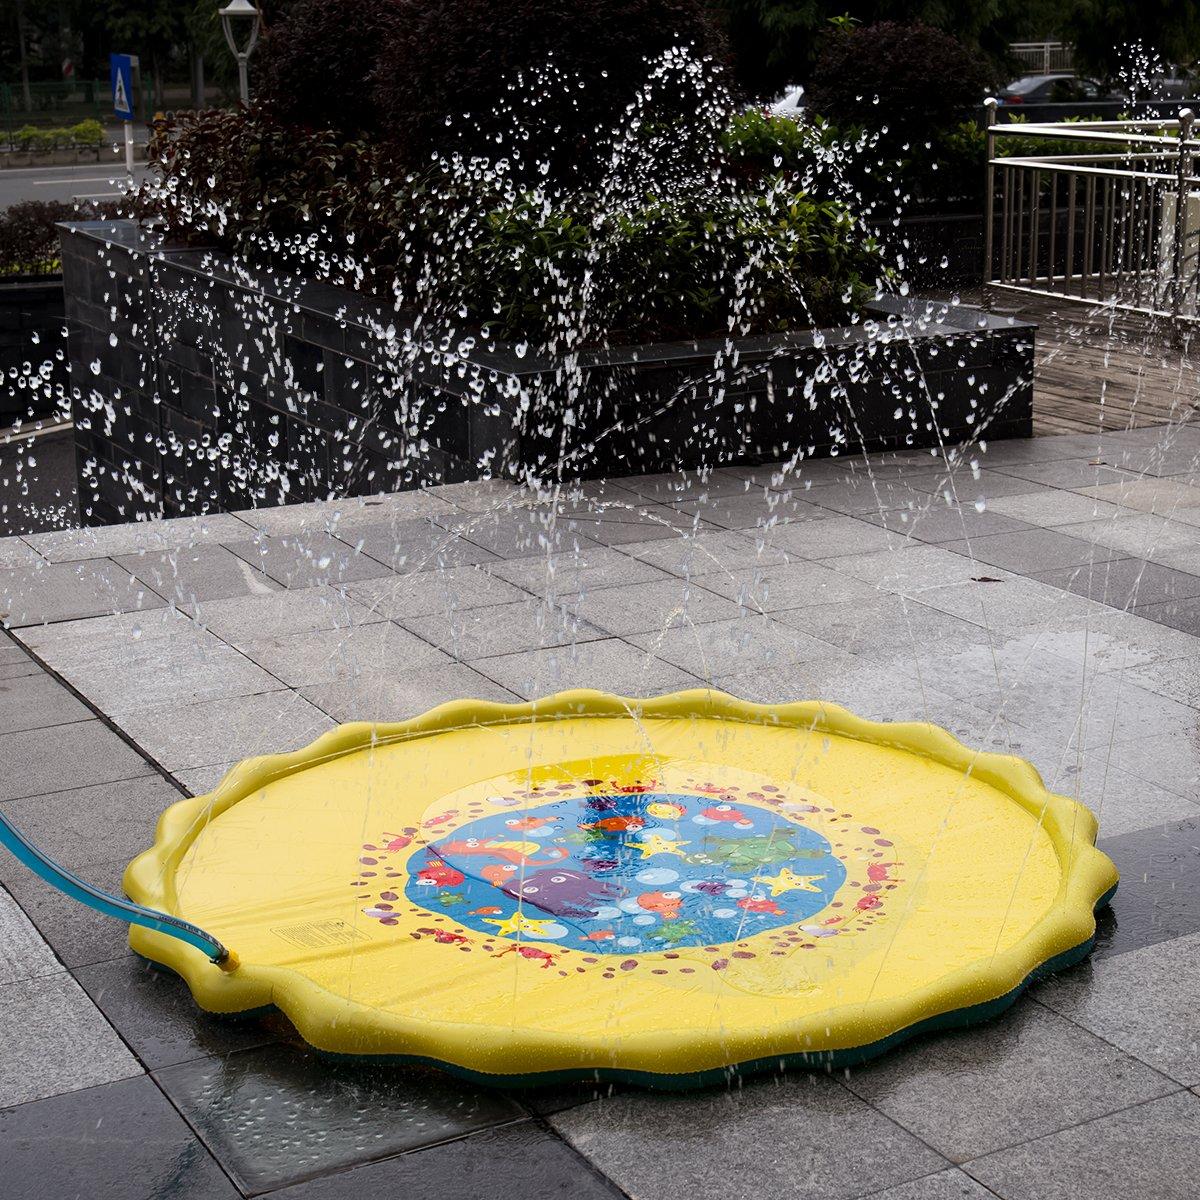 HALOFUN 67in-Diameter Sprinkle and Splash Play Mat for Kids (Yellow)